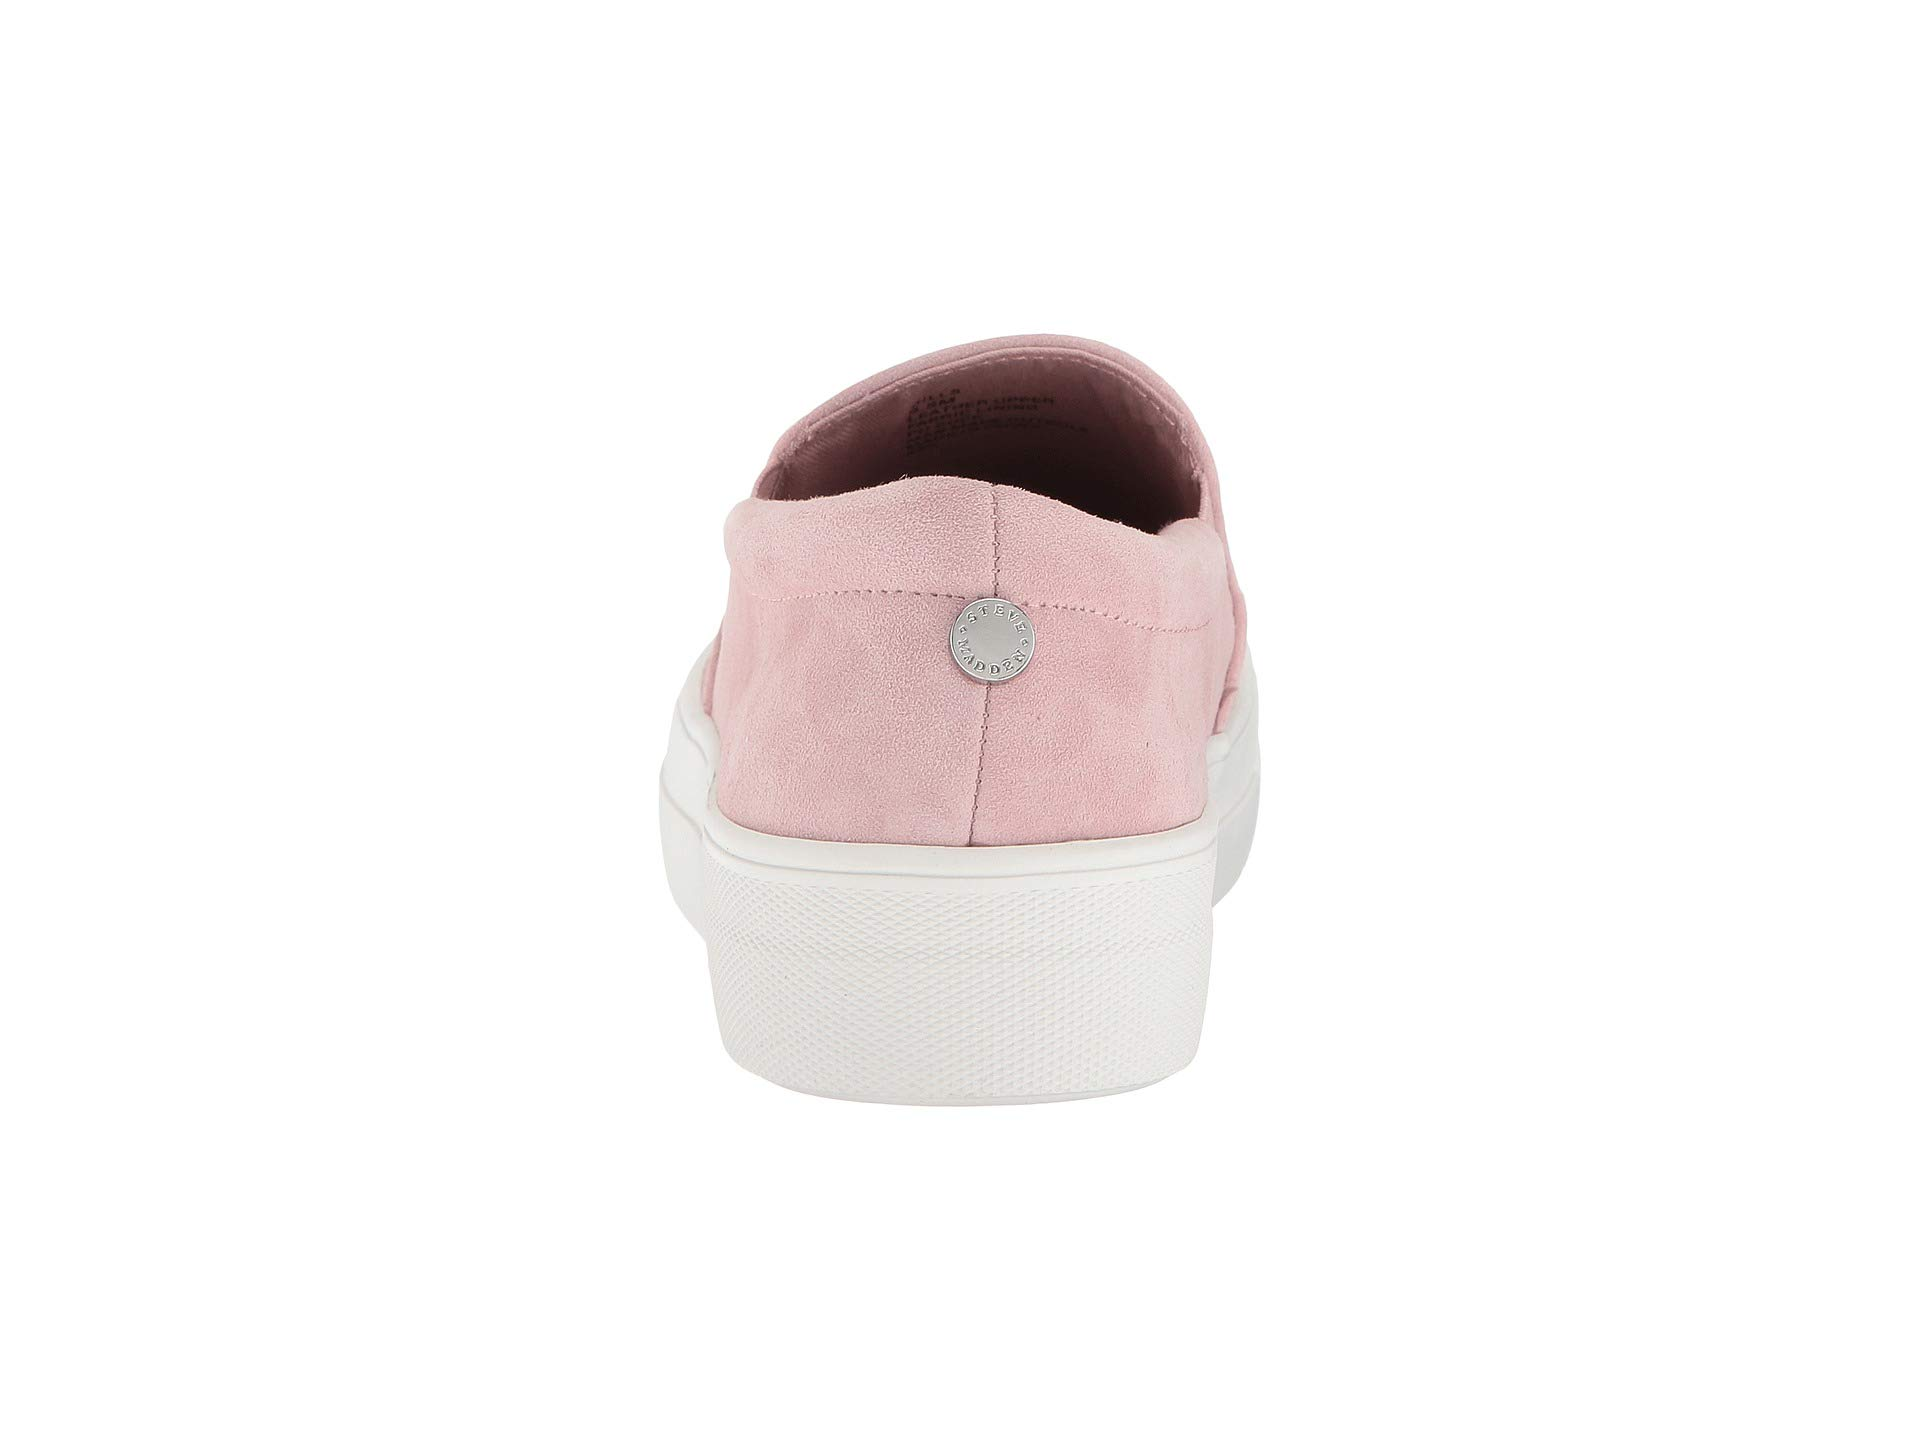 Suede Sneaker Gills Madden Blush Steve qnZwfzxCw